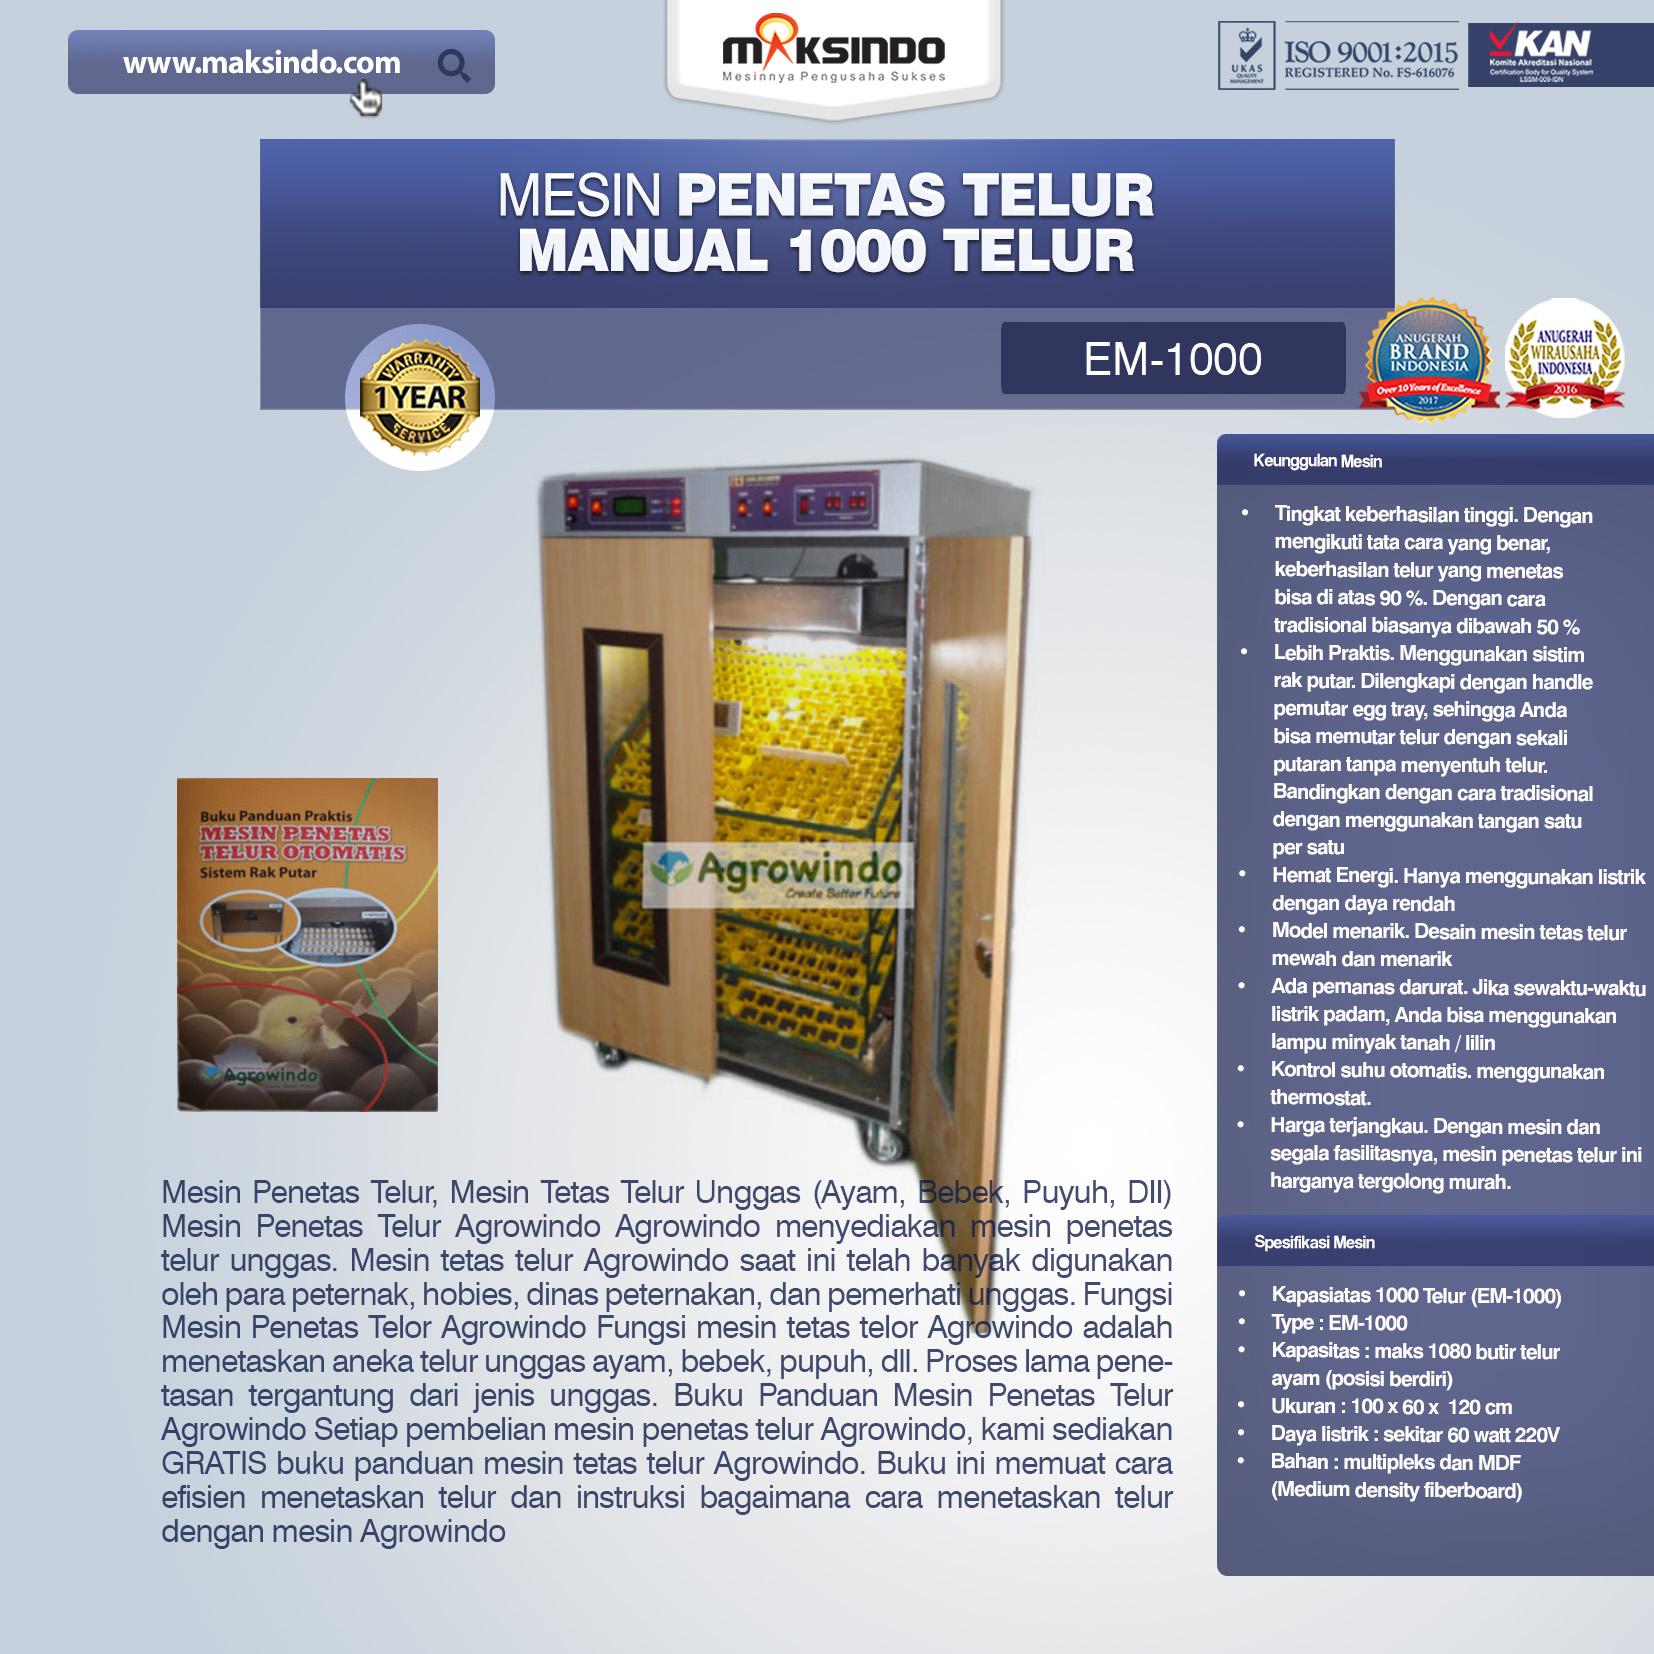 Jual Mesin Penetas Telur Manual 1000 Telur (EM-1000) di Bandung